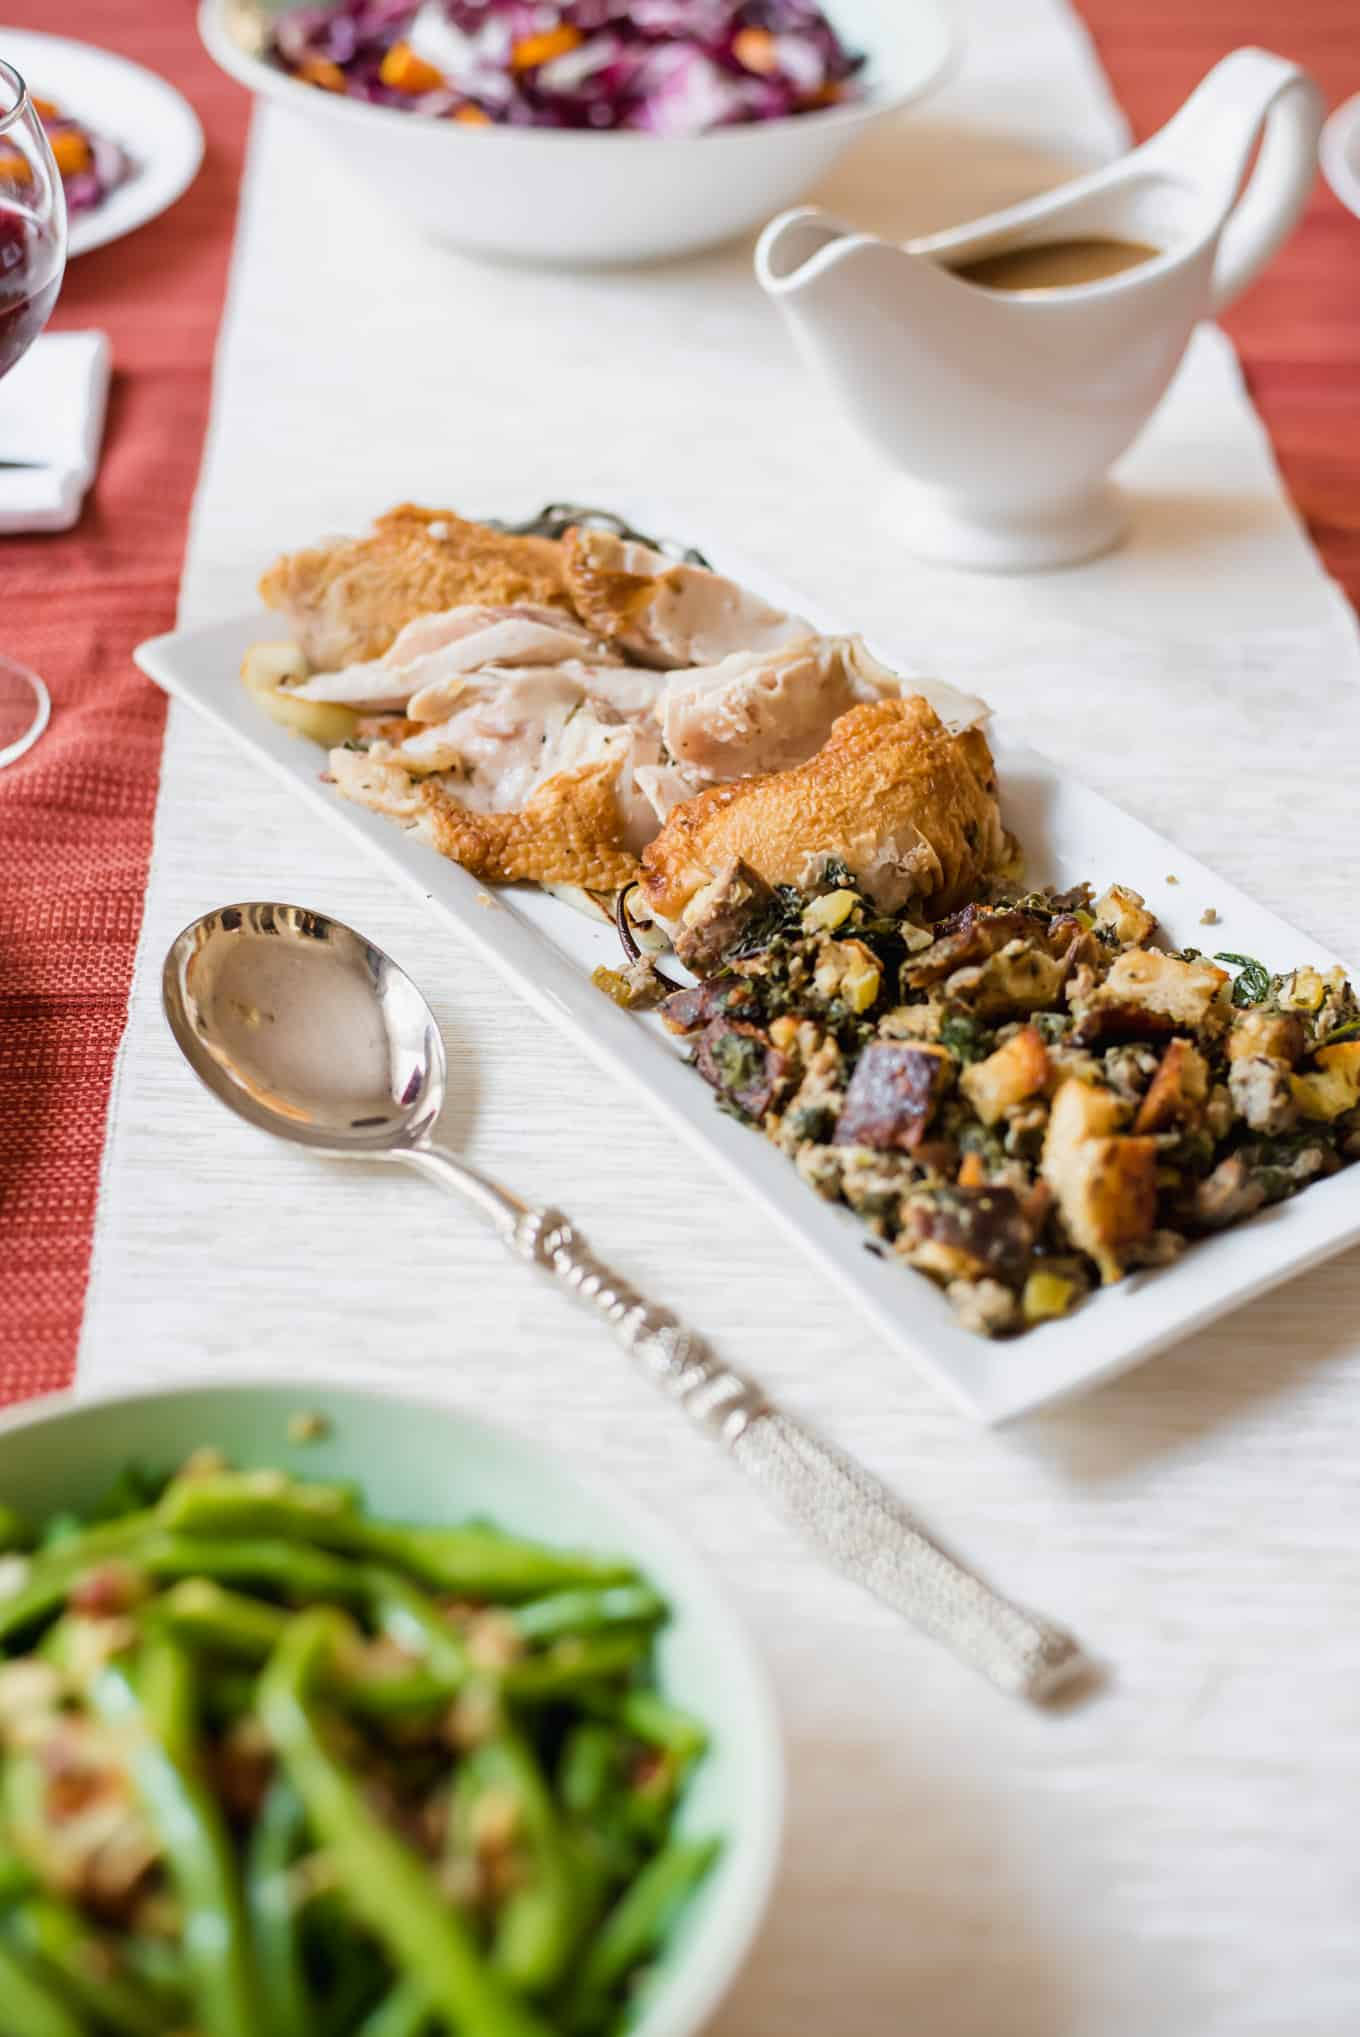 Julia Turshen's Radicchio + Roasted Squash Salad & Hosting a Stress-Free Thanksgiving | omgfood.com